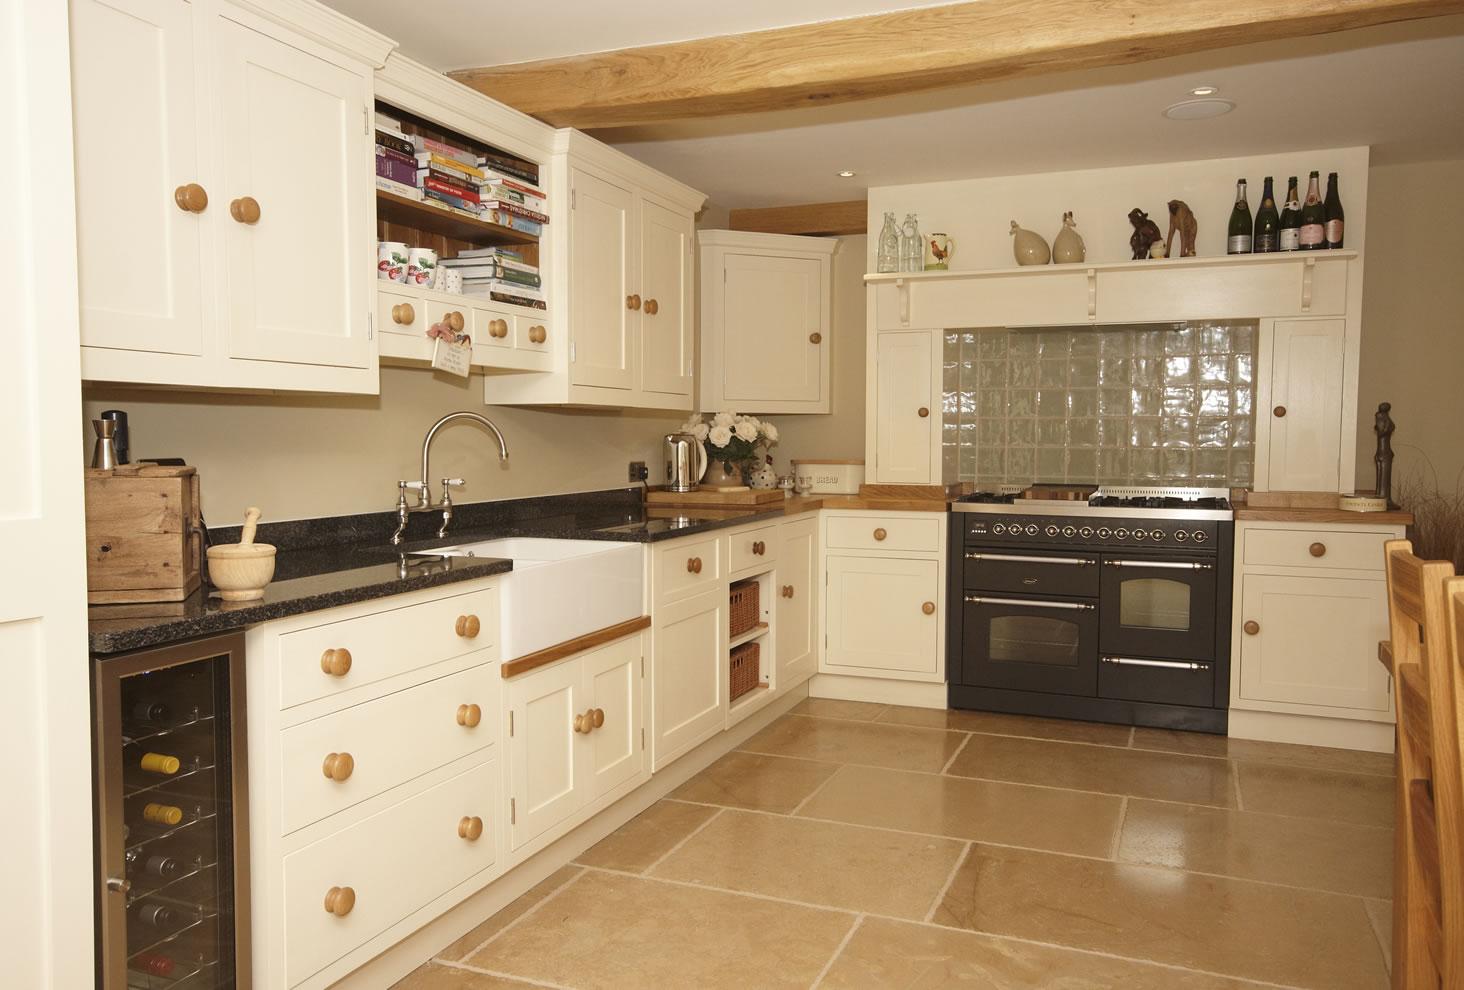 North bar kitchens interiors traditional range for Traditional kitchen designs for small kitchens